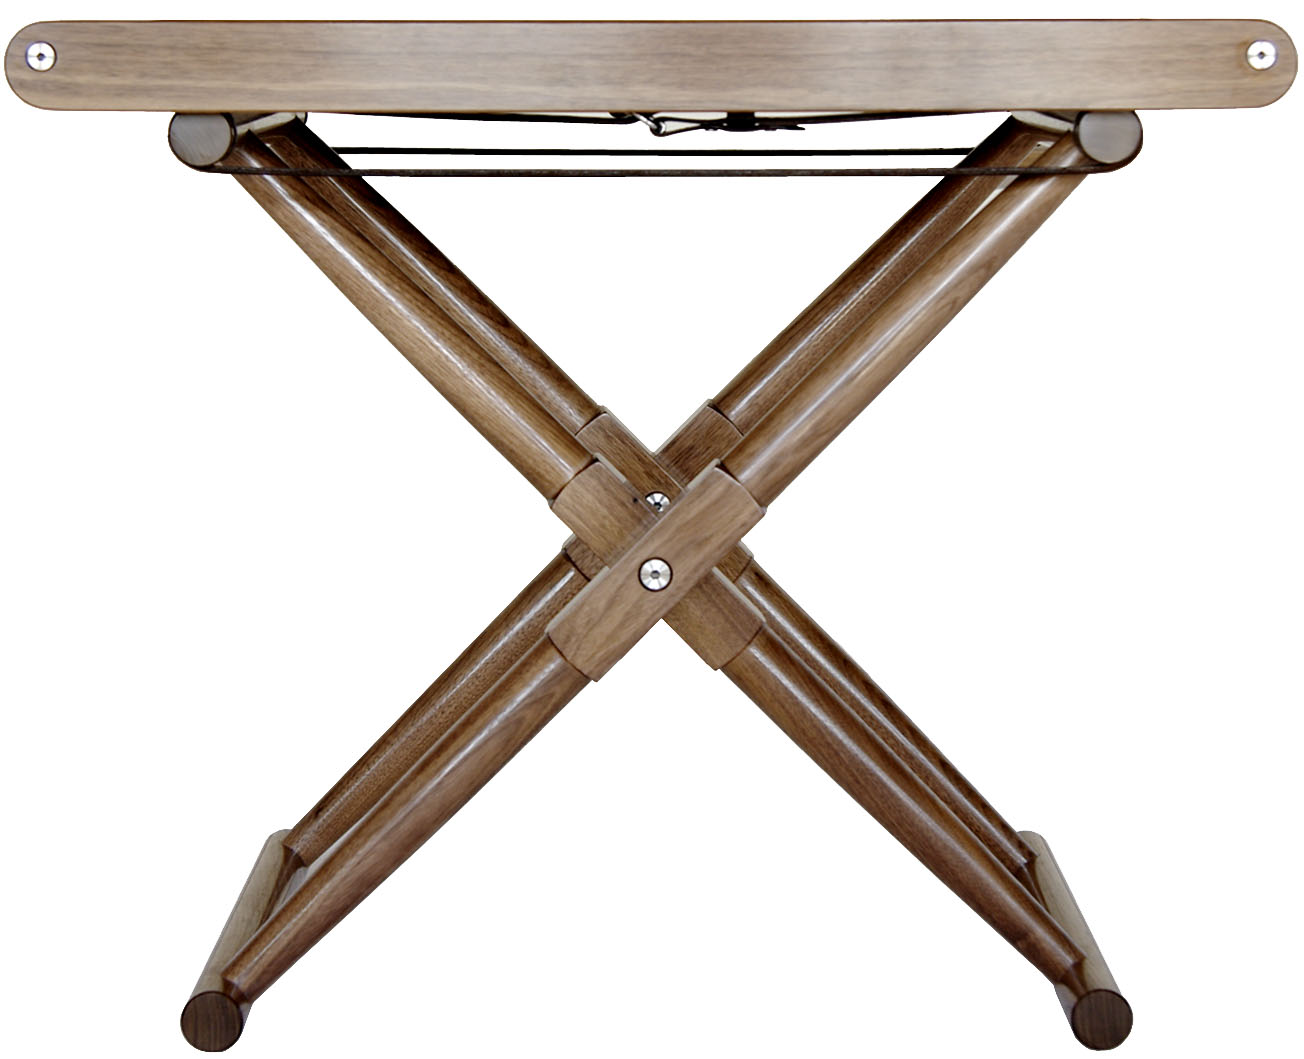 Matthiessen Tray Table